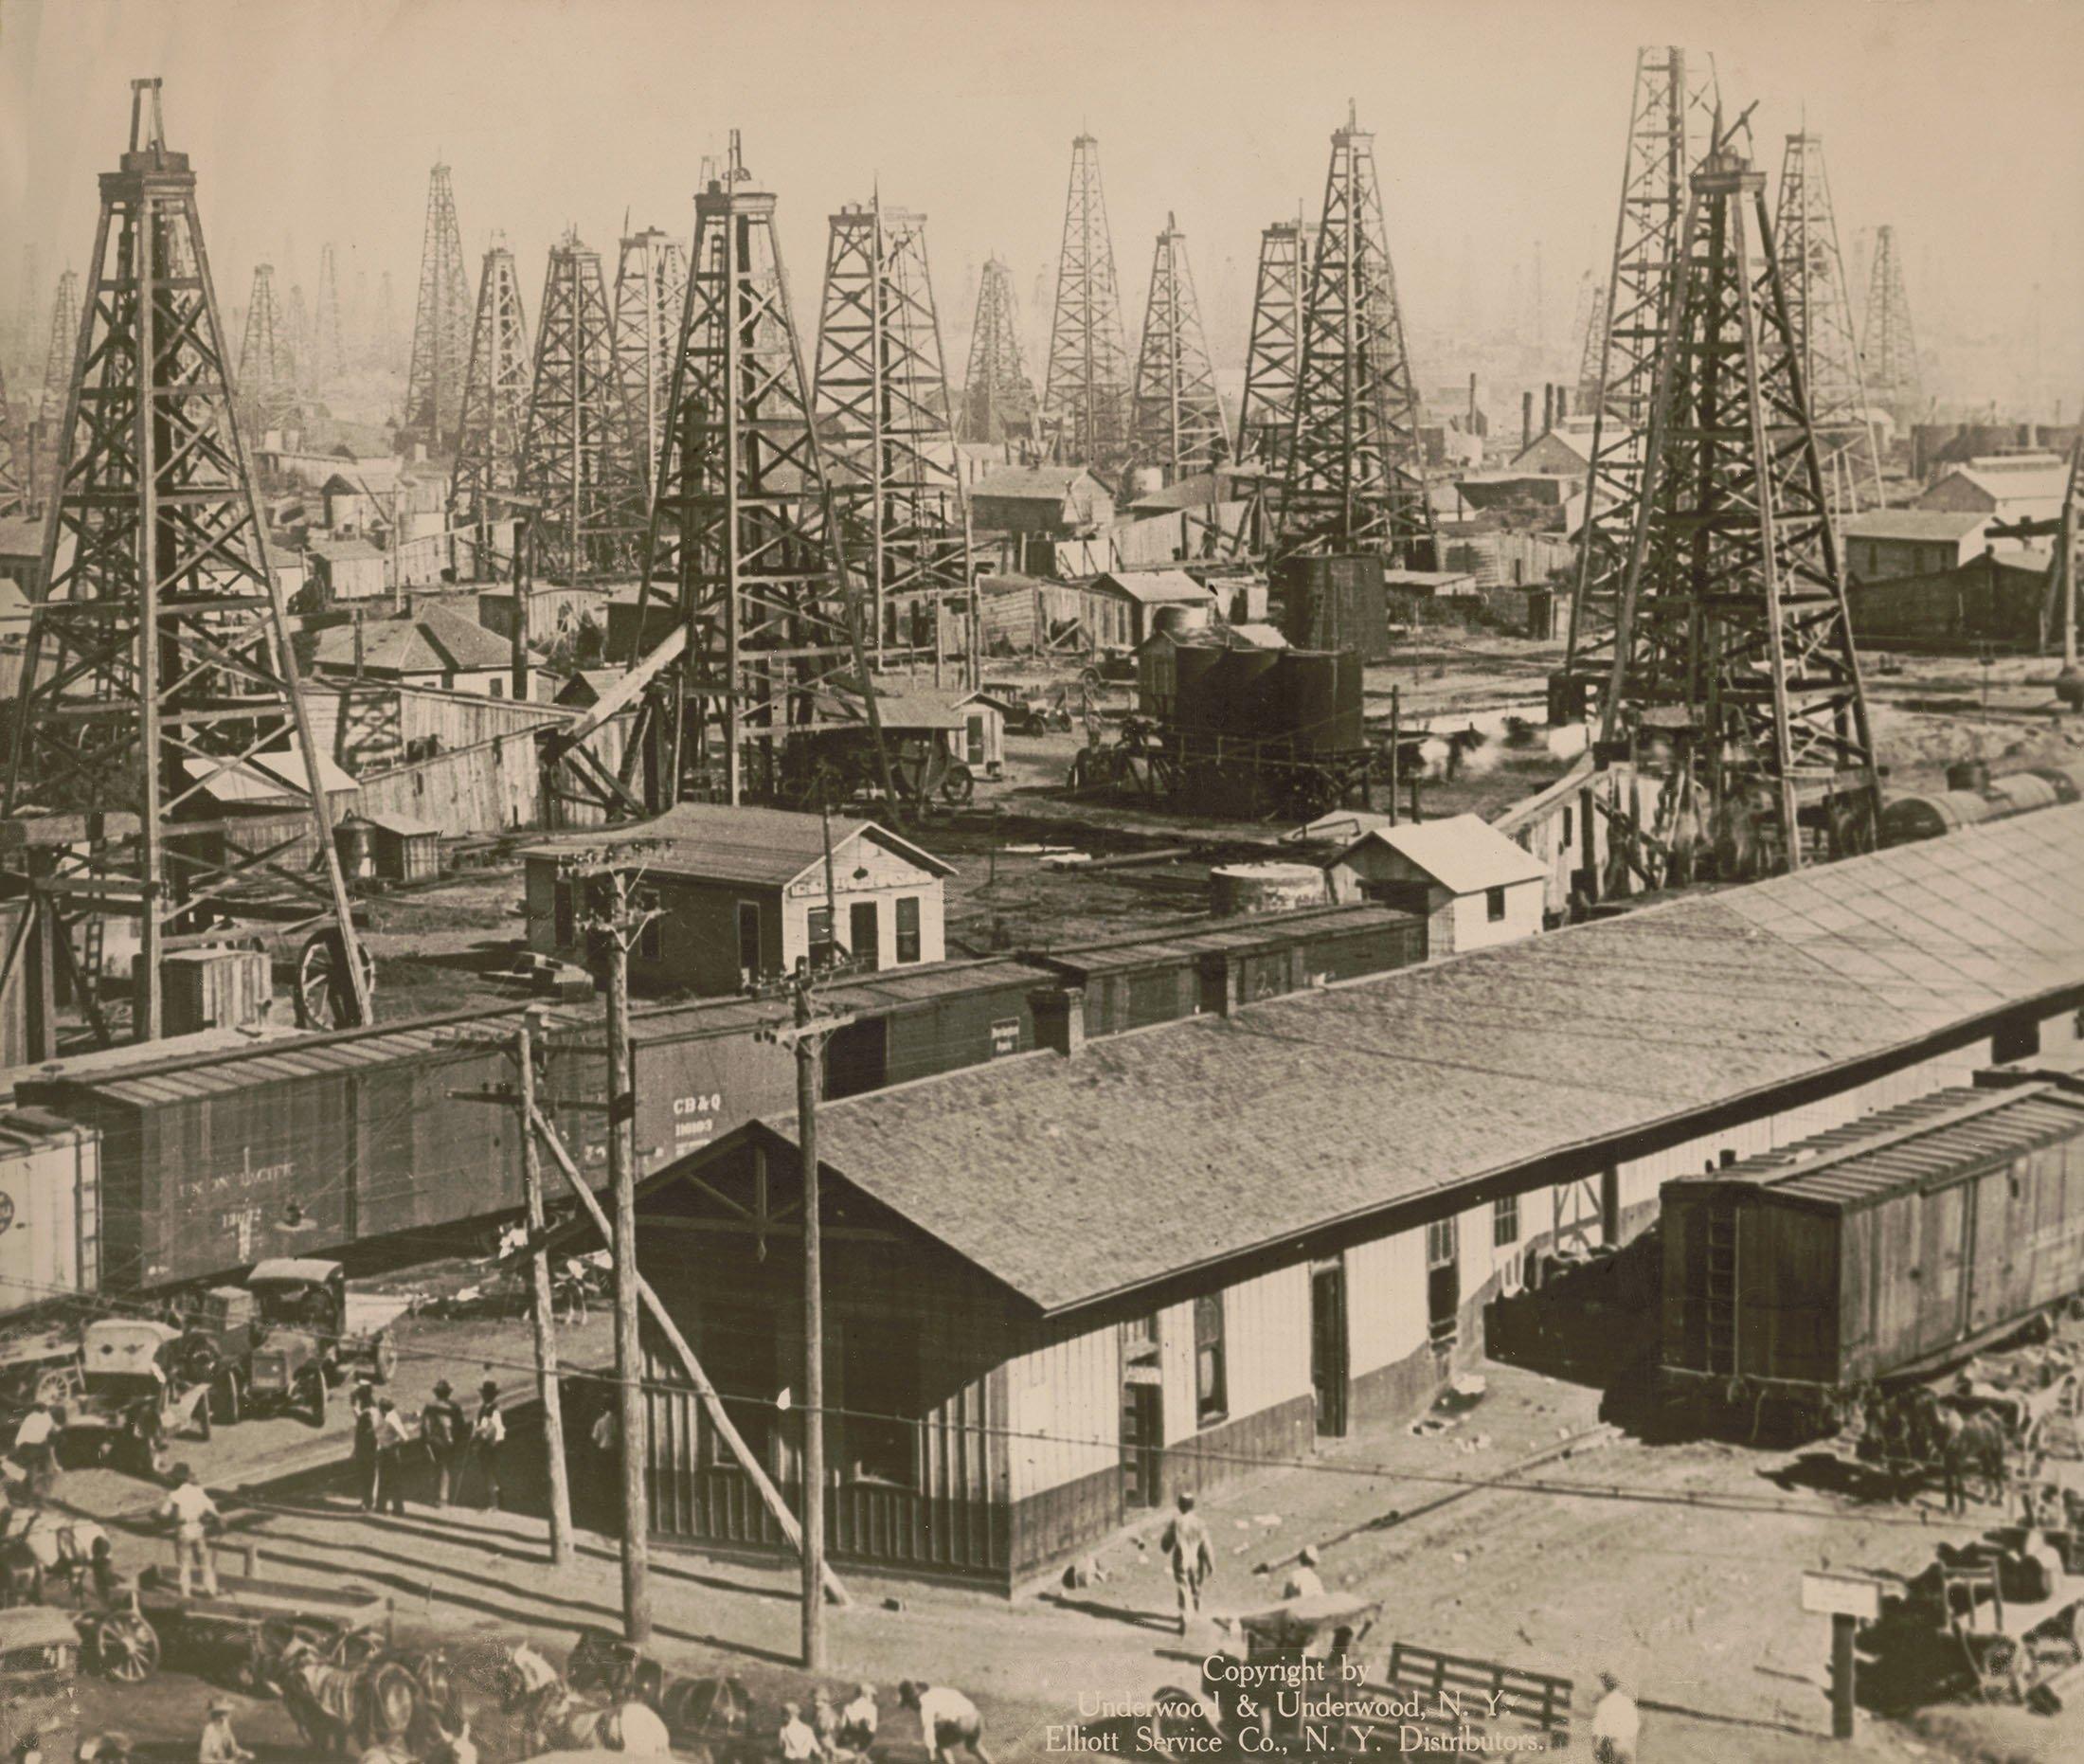 Operational oil derricks and street scene can be seen inBurkburnett, Texas, U.S., 1920. (Getty Images)